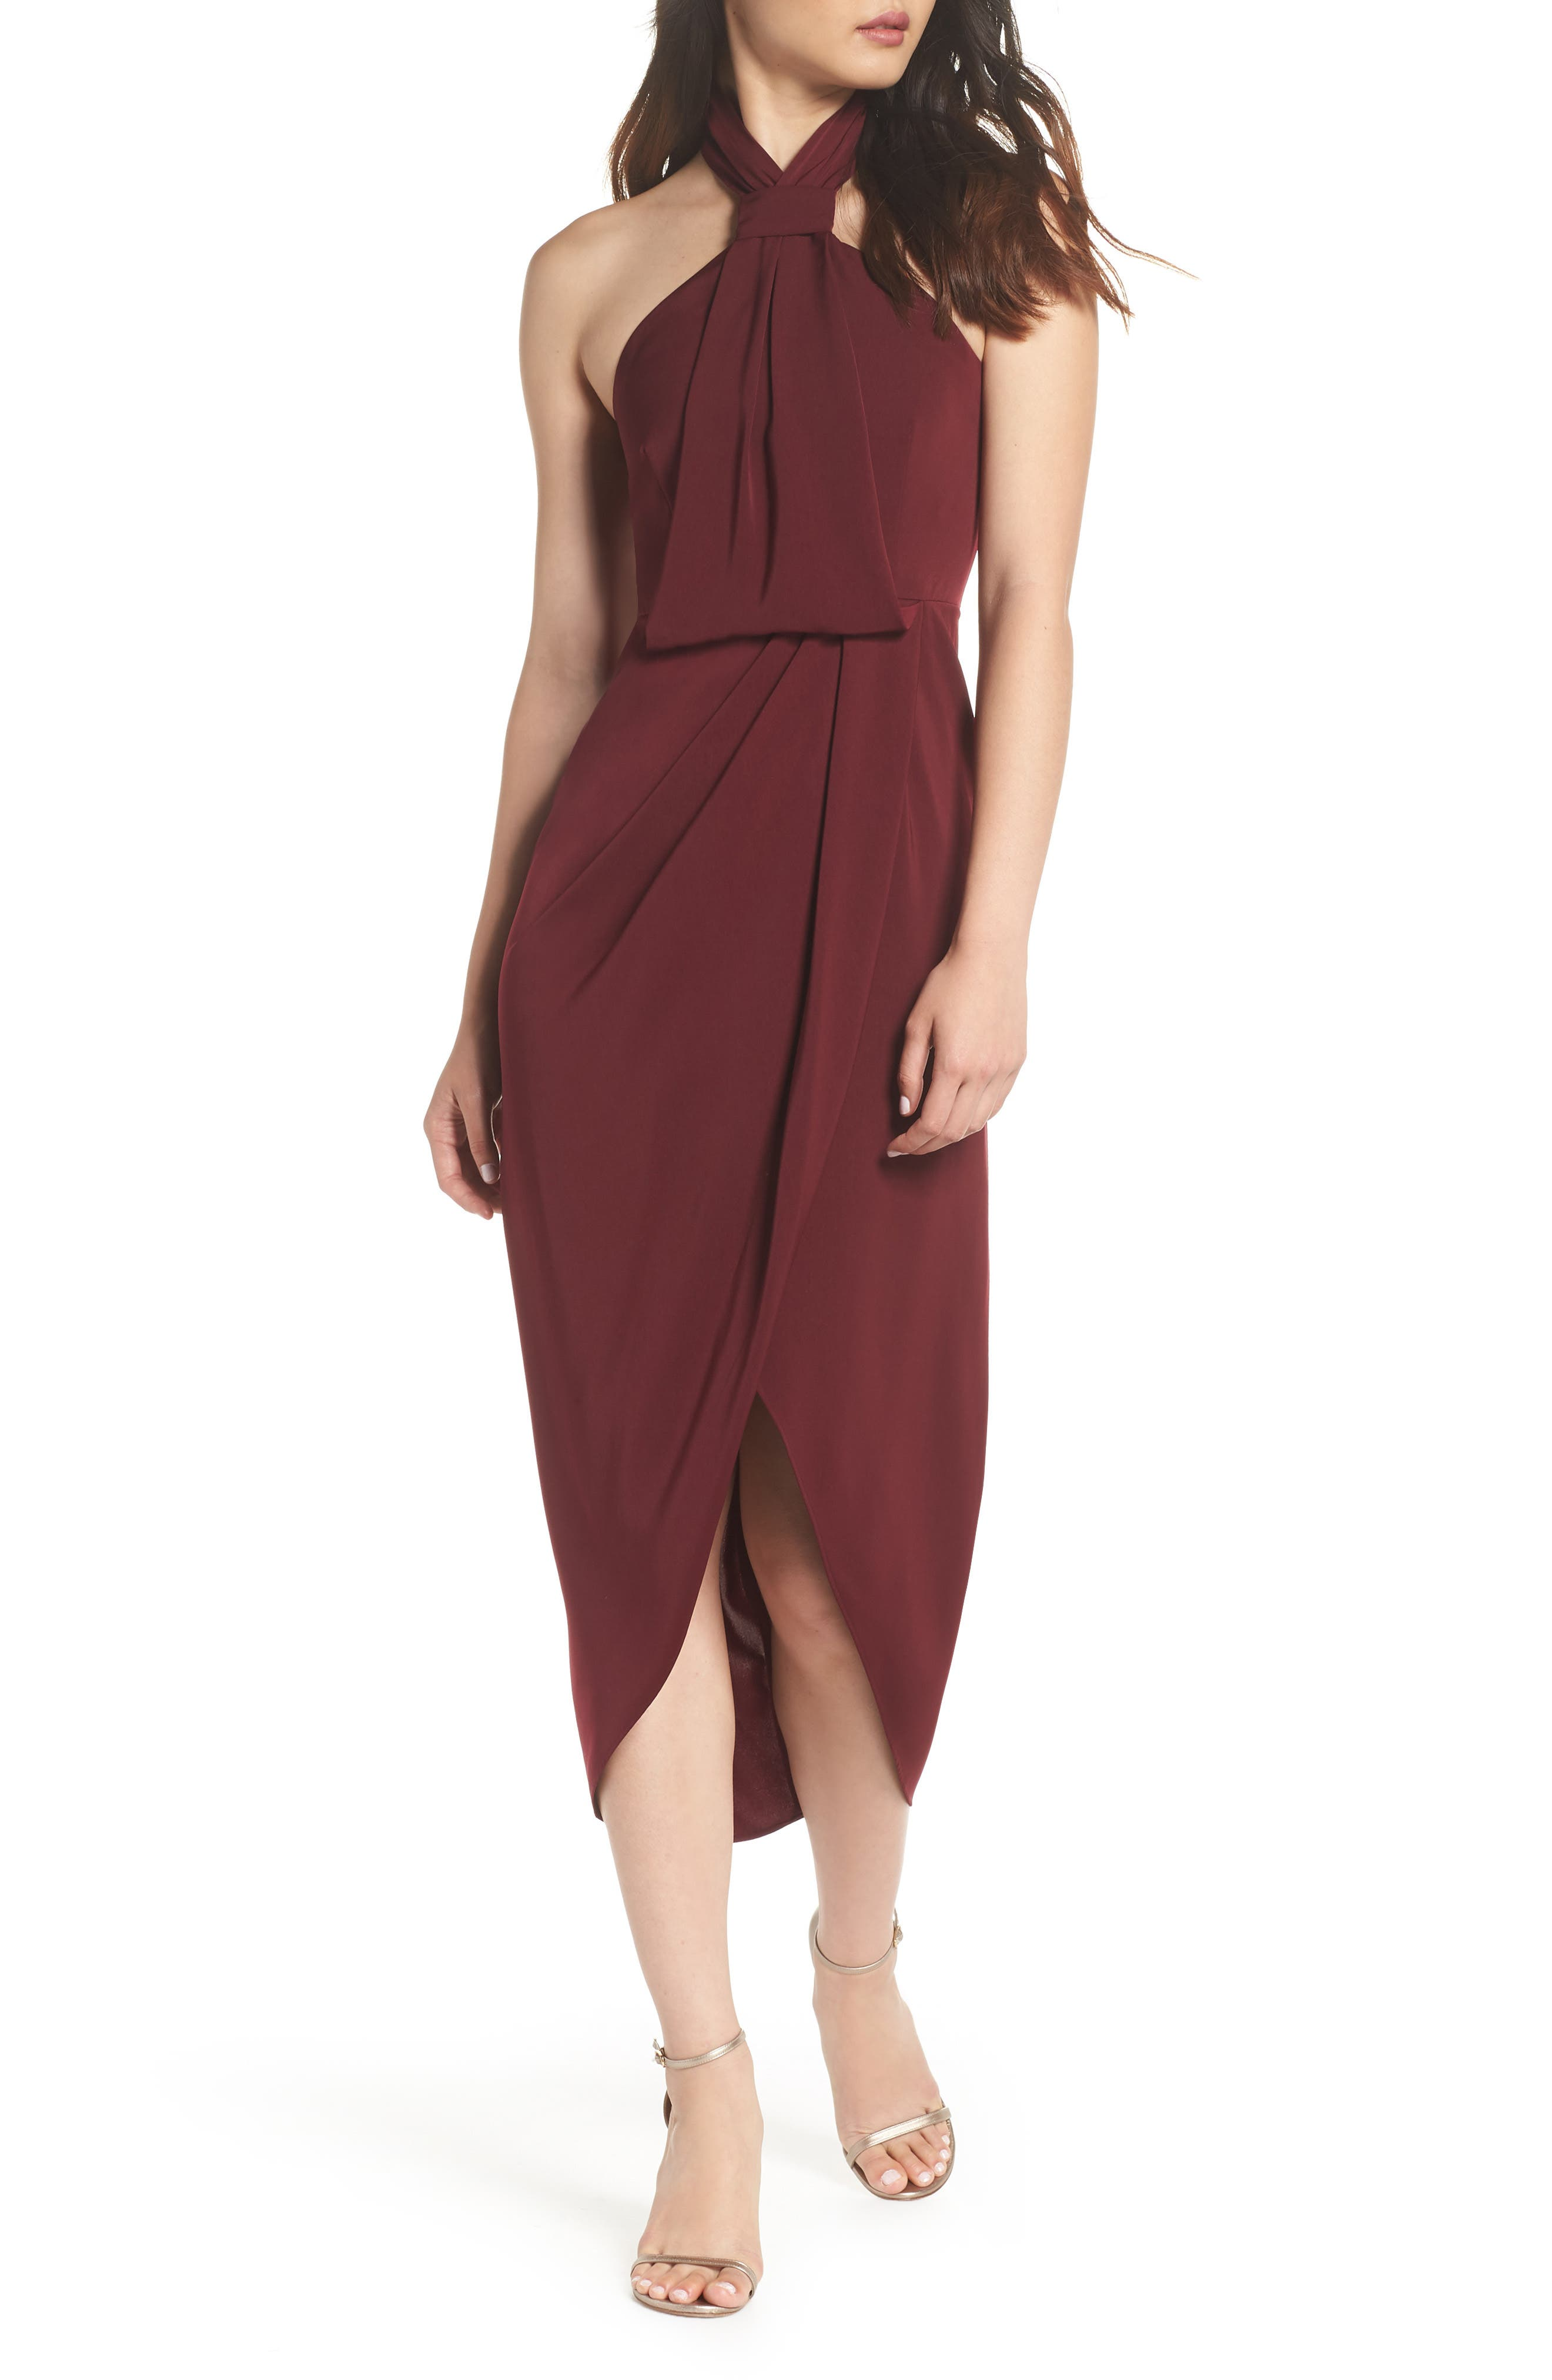 SHONA JOY Knotted Tulip Hem Midi Dress, Main, color, BURGUNDY